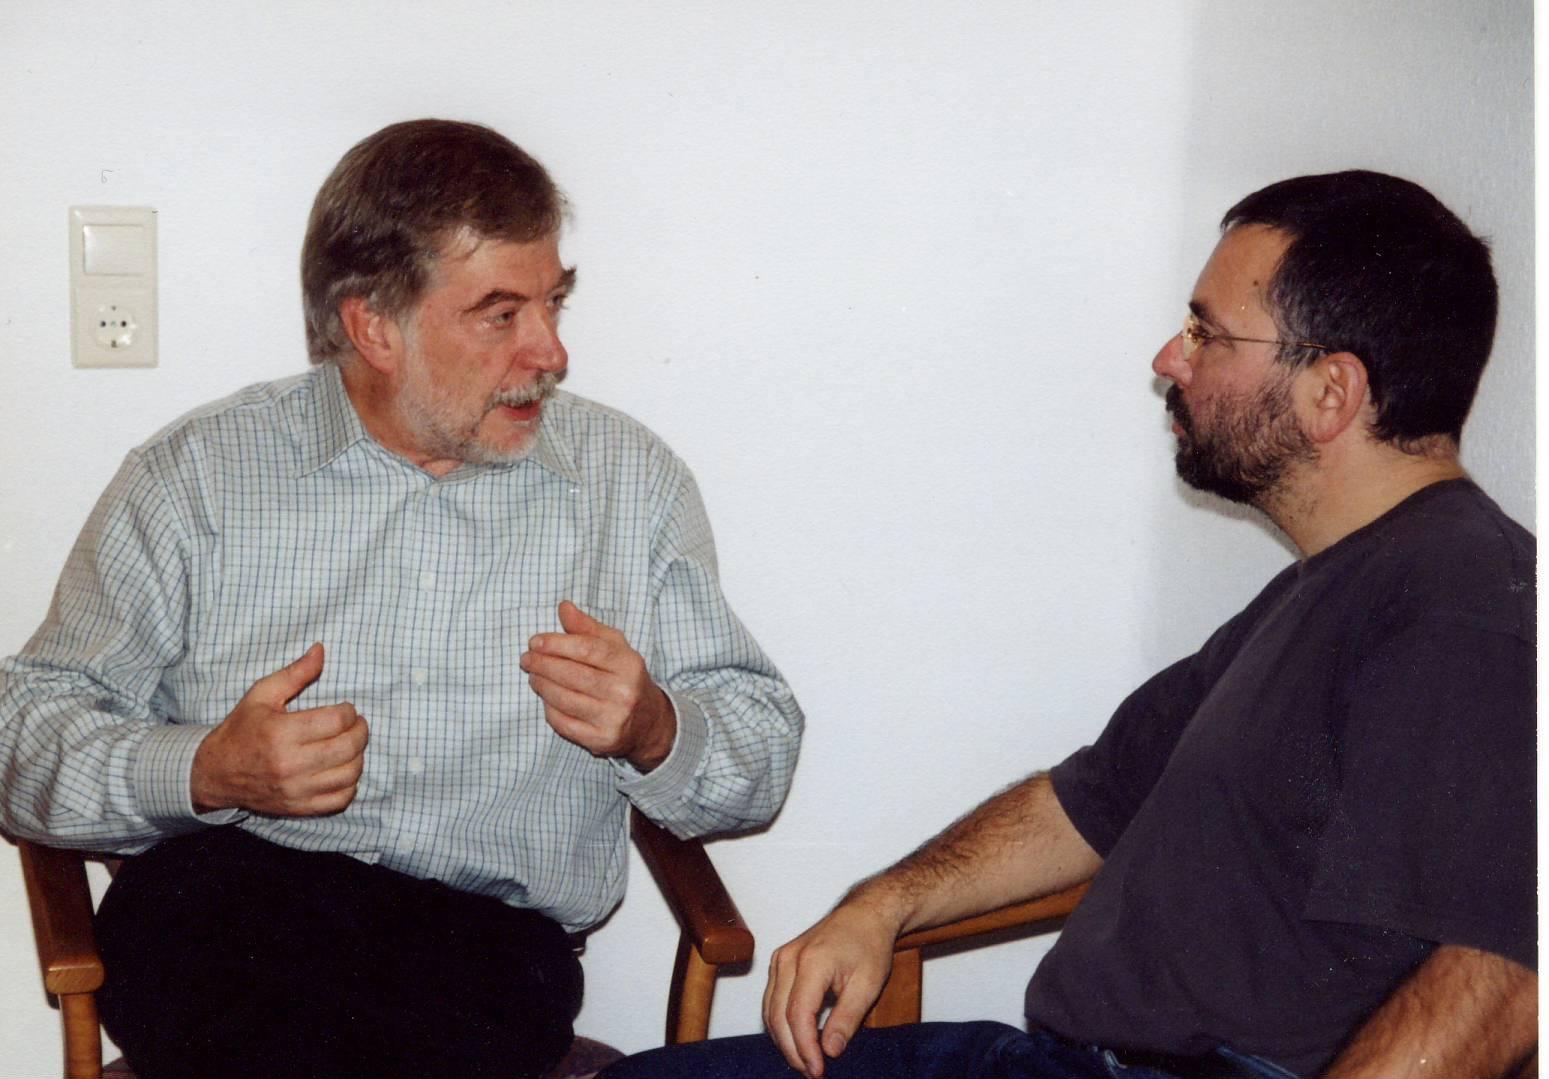 Hans-Joachim Maaz und Andreas Peglau, 2002 in Halle/Saale